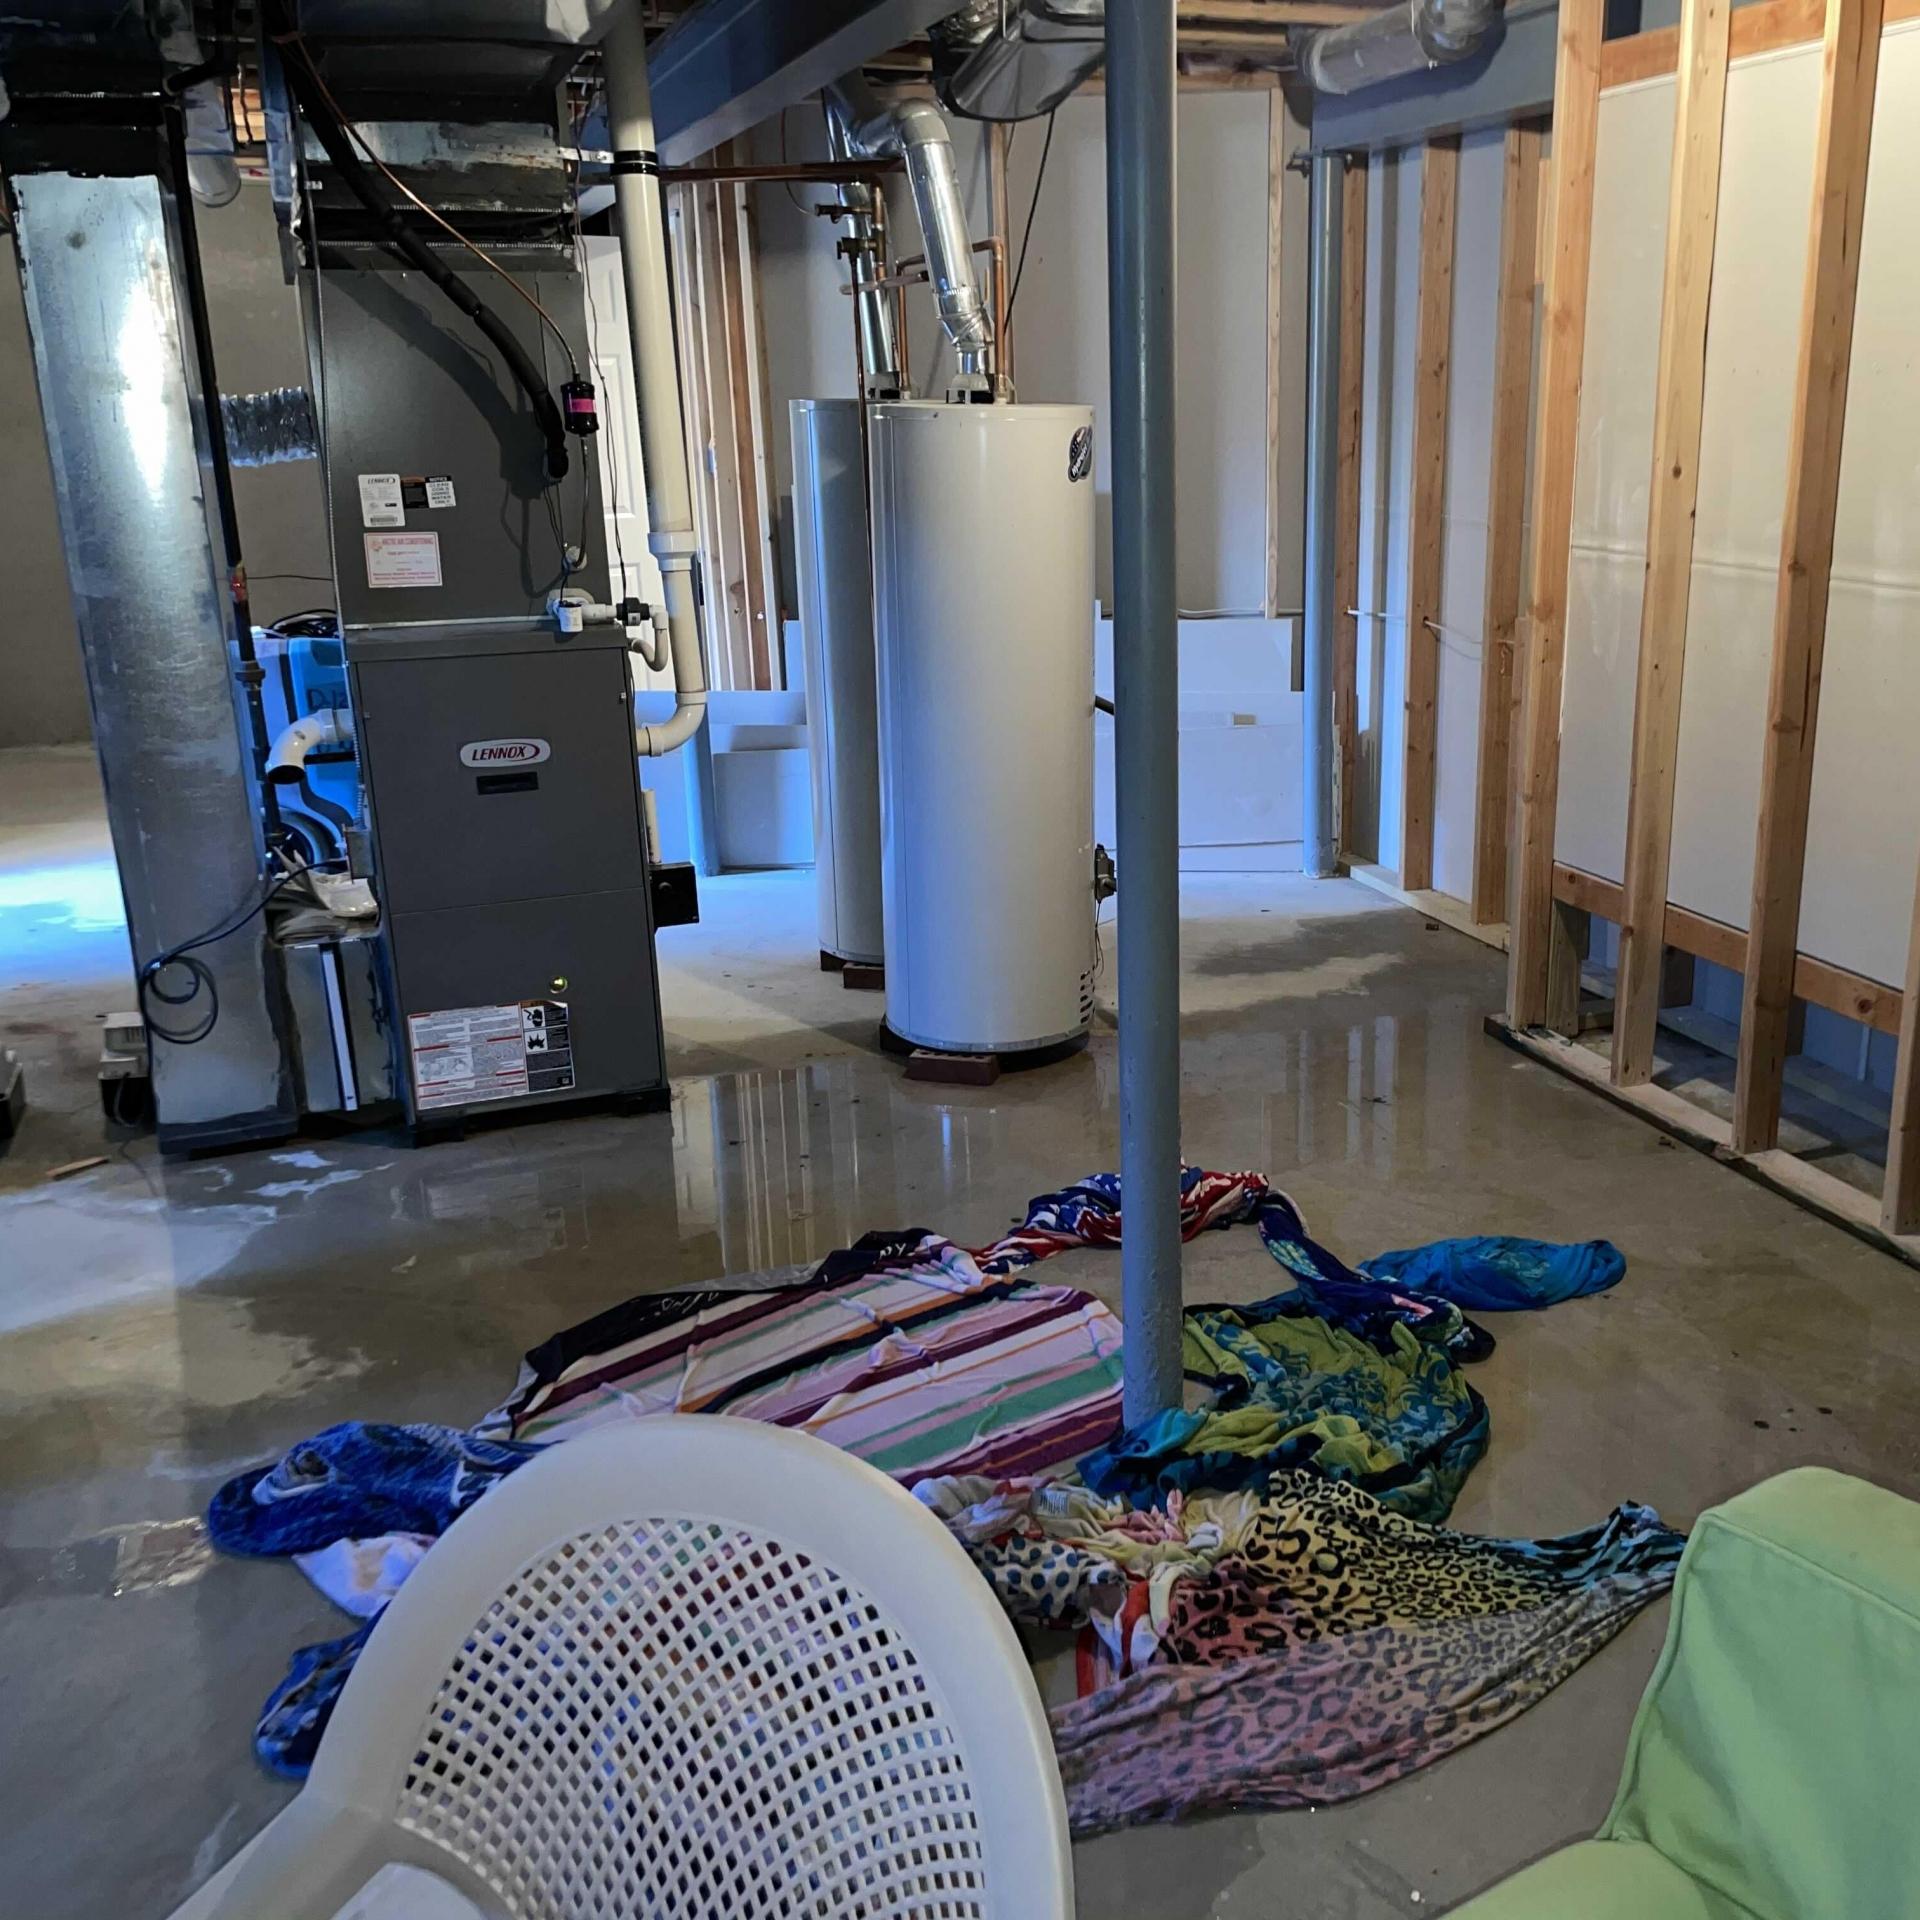 Refrigerator Leak Water Damage in Freehold, NJ